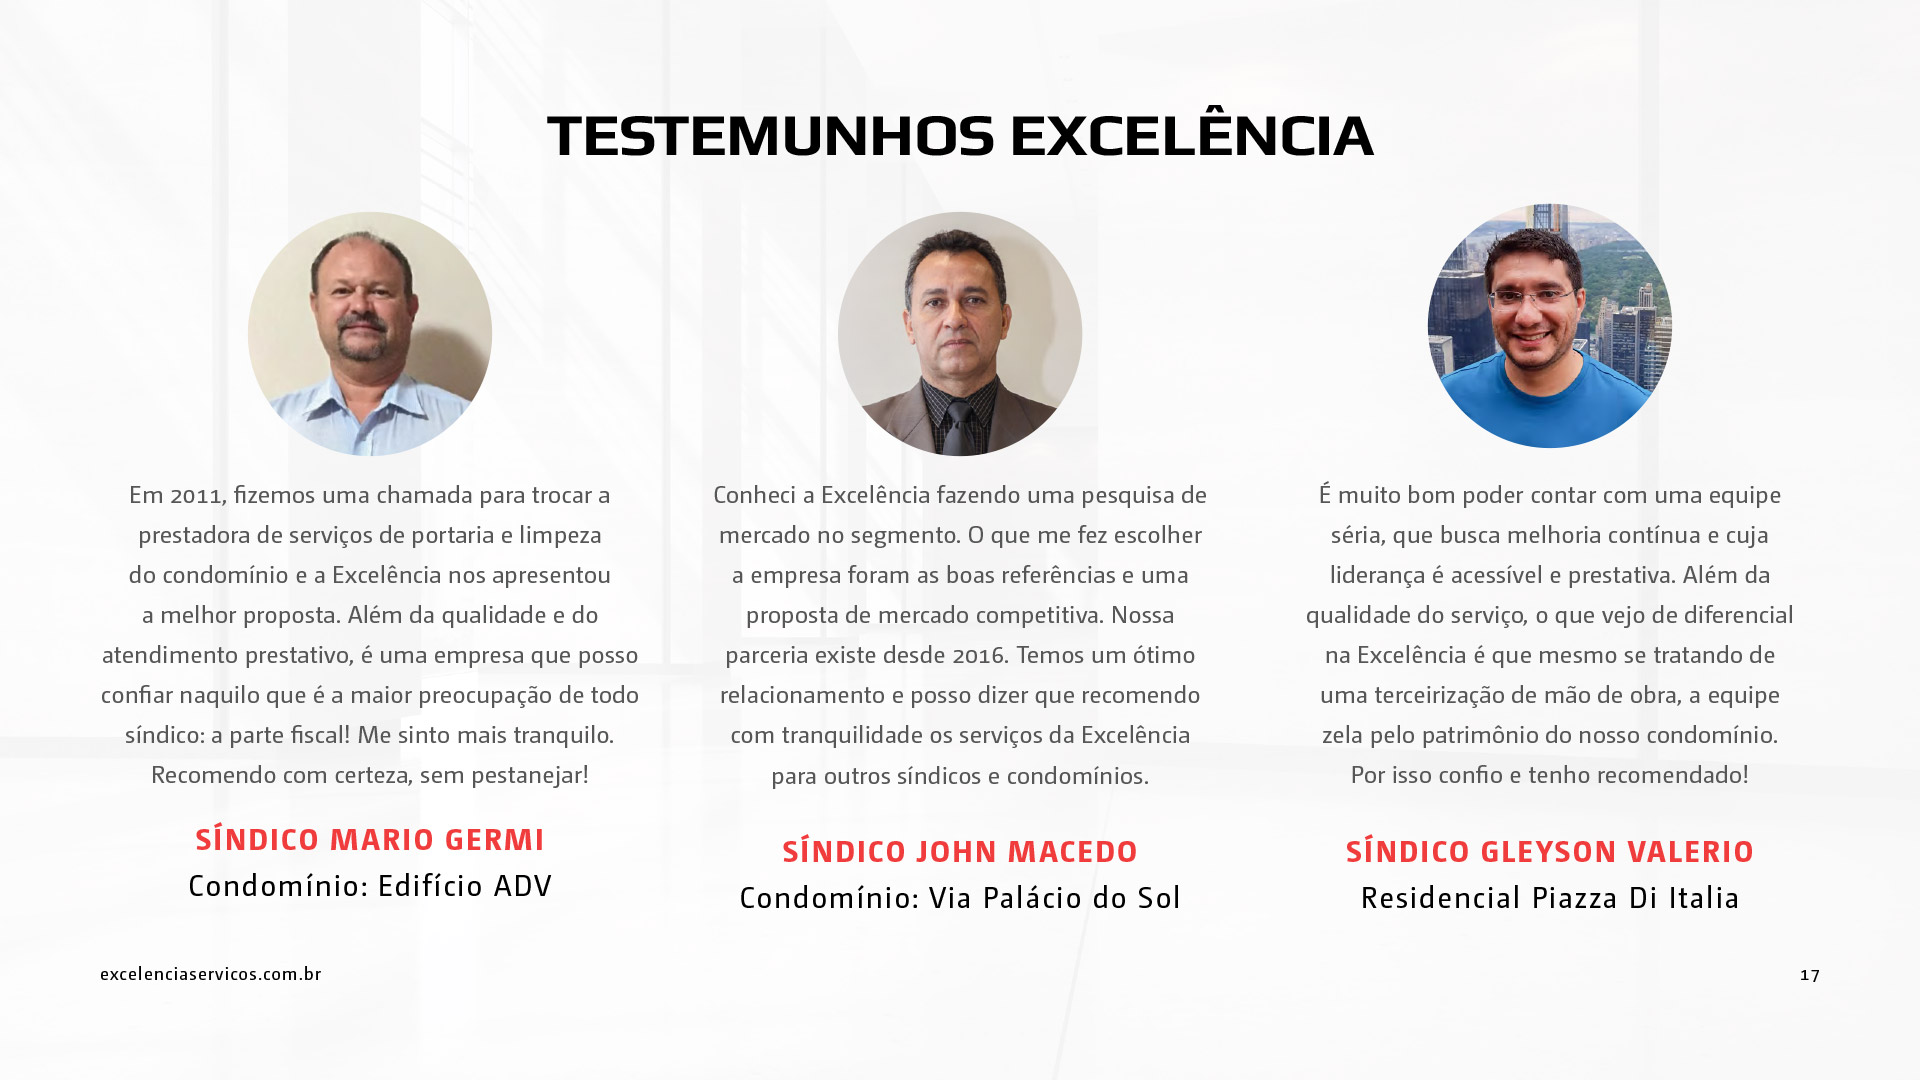 apresentacao-excelencia-17